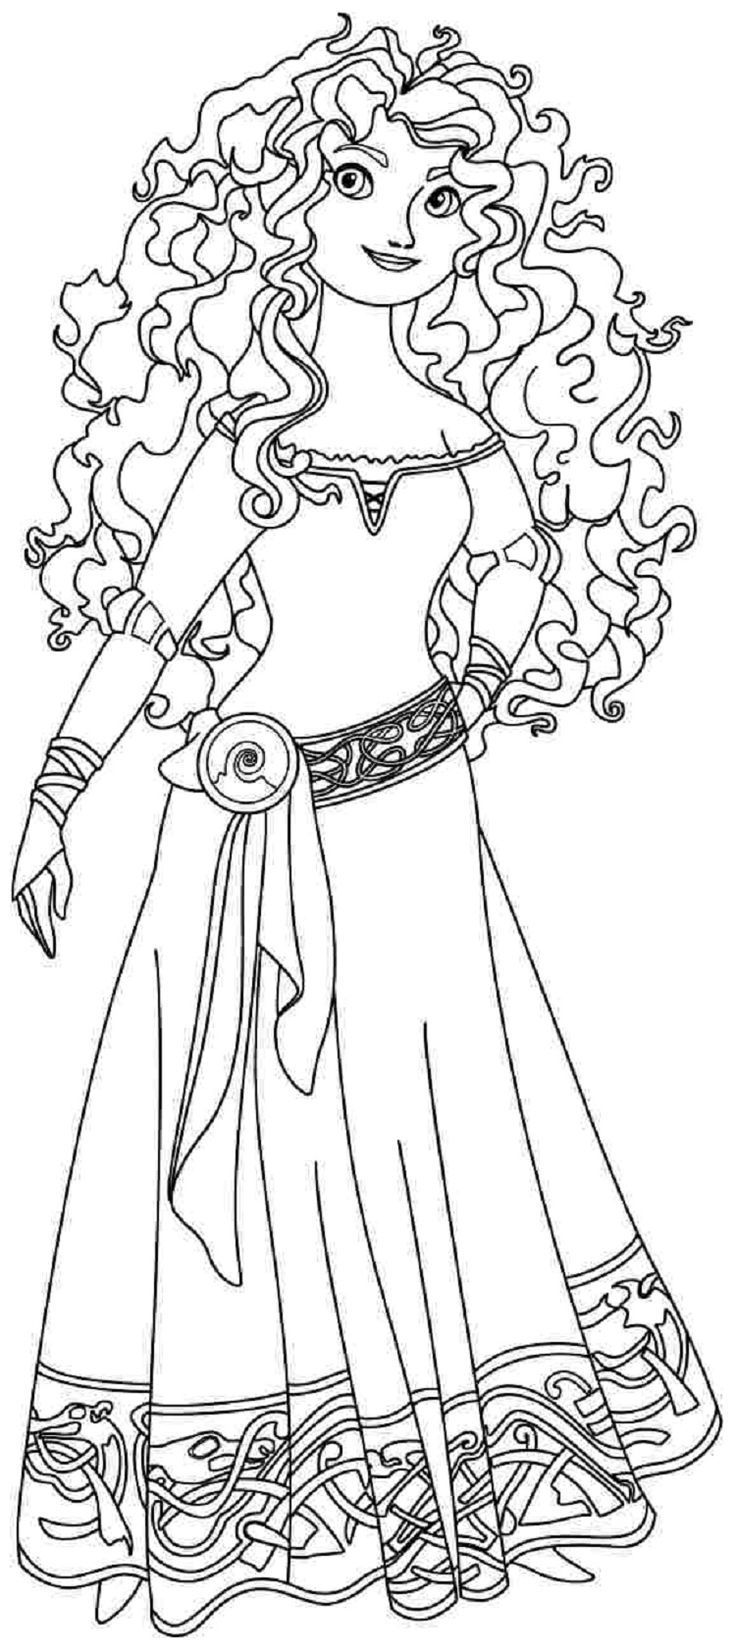 Disney Princess Coloring Pages Merida Disney Princess